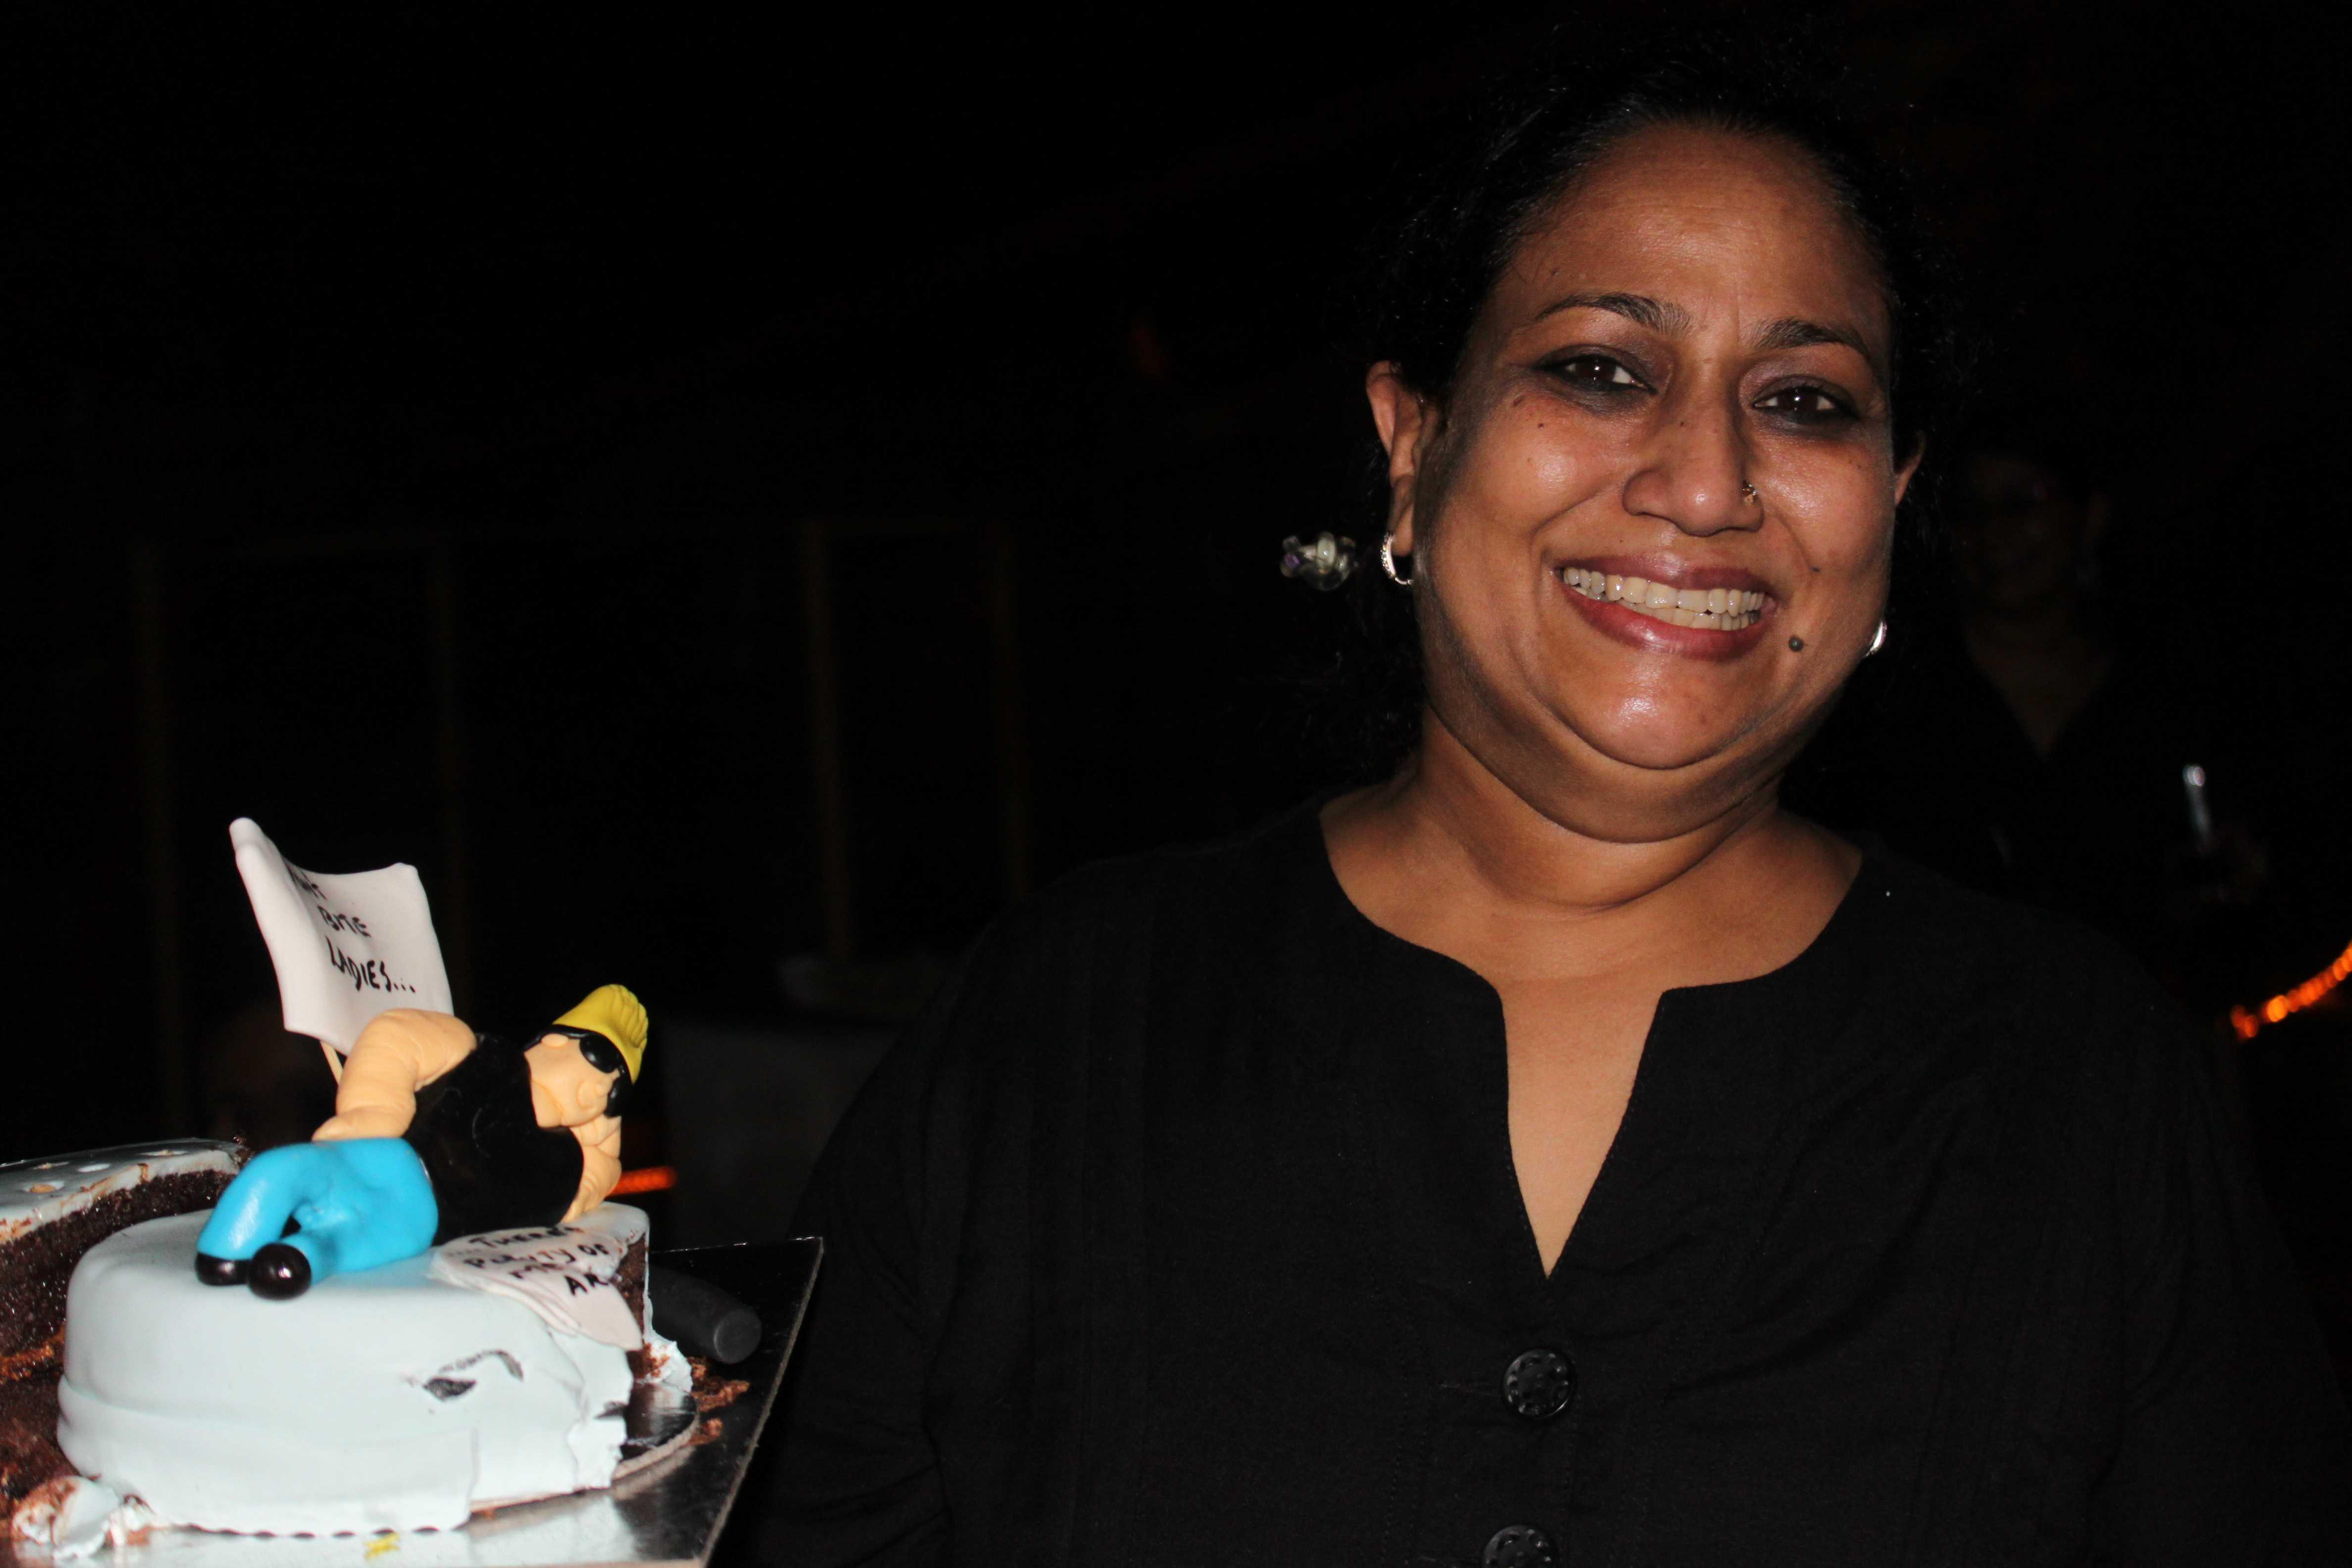 Vinita Mehta, the brainchild behind Love is..Cakes